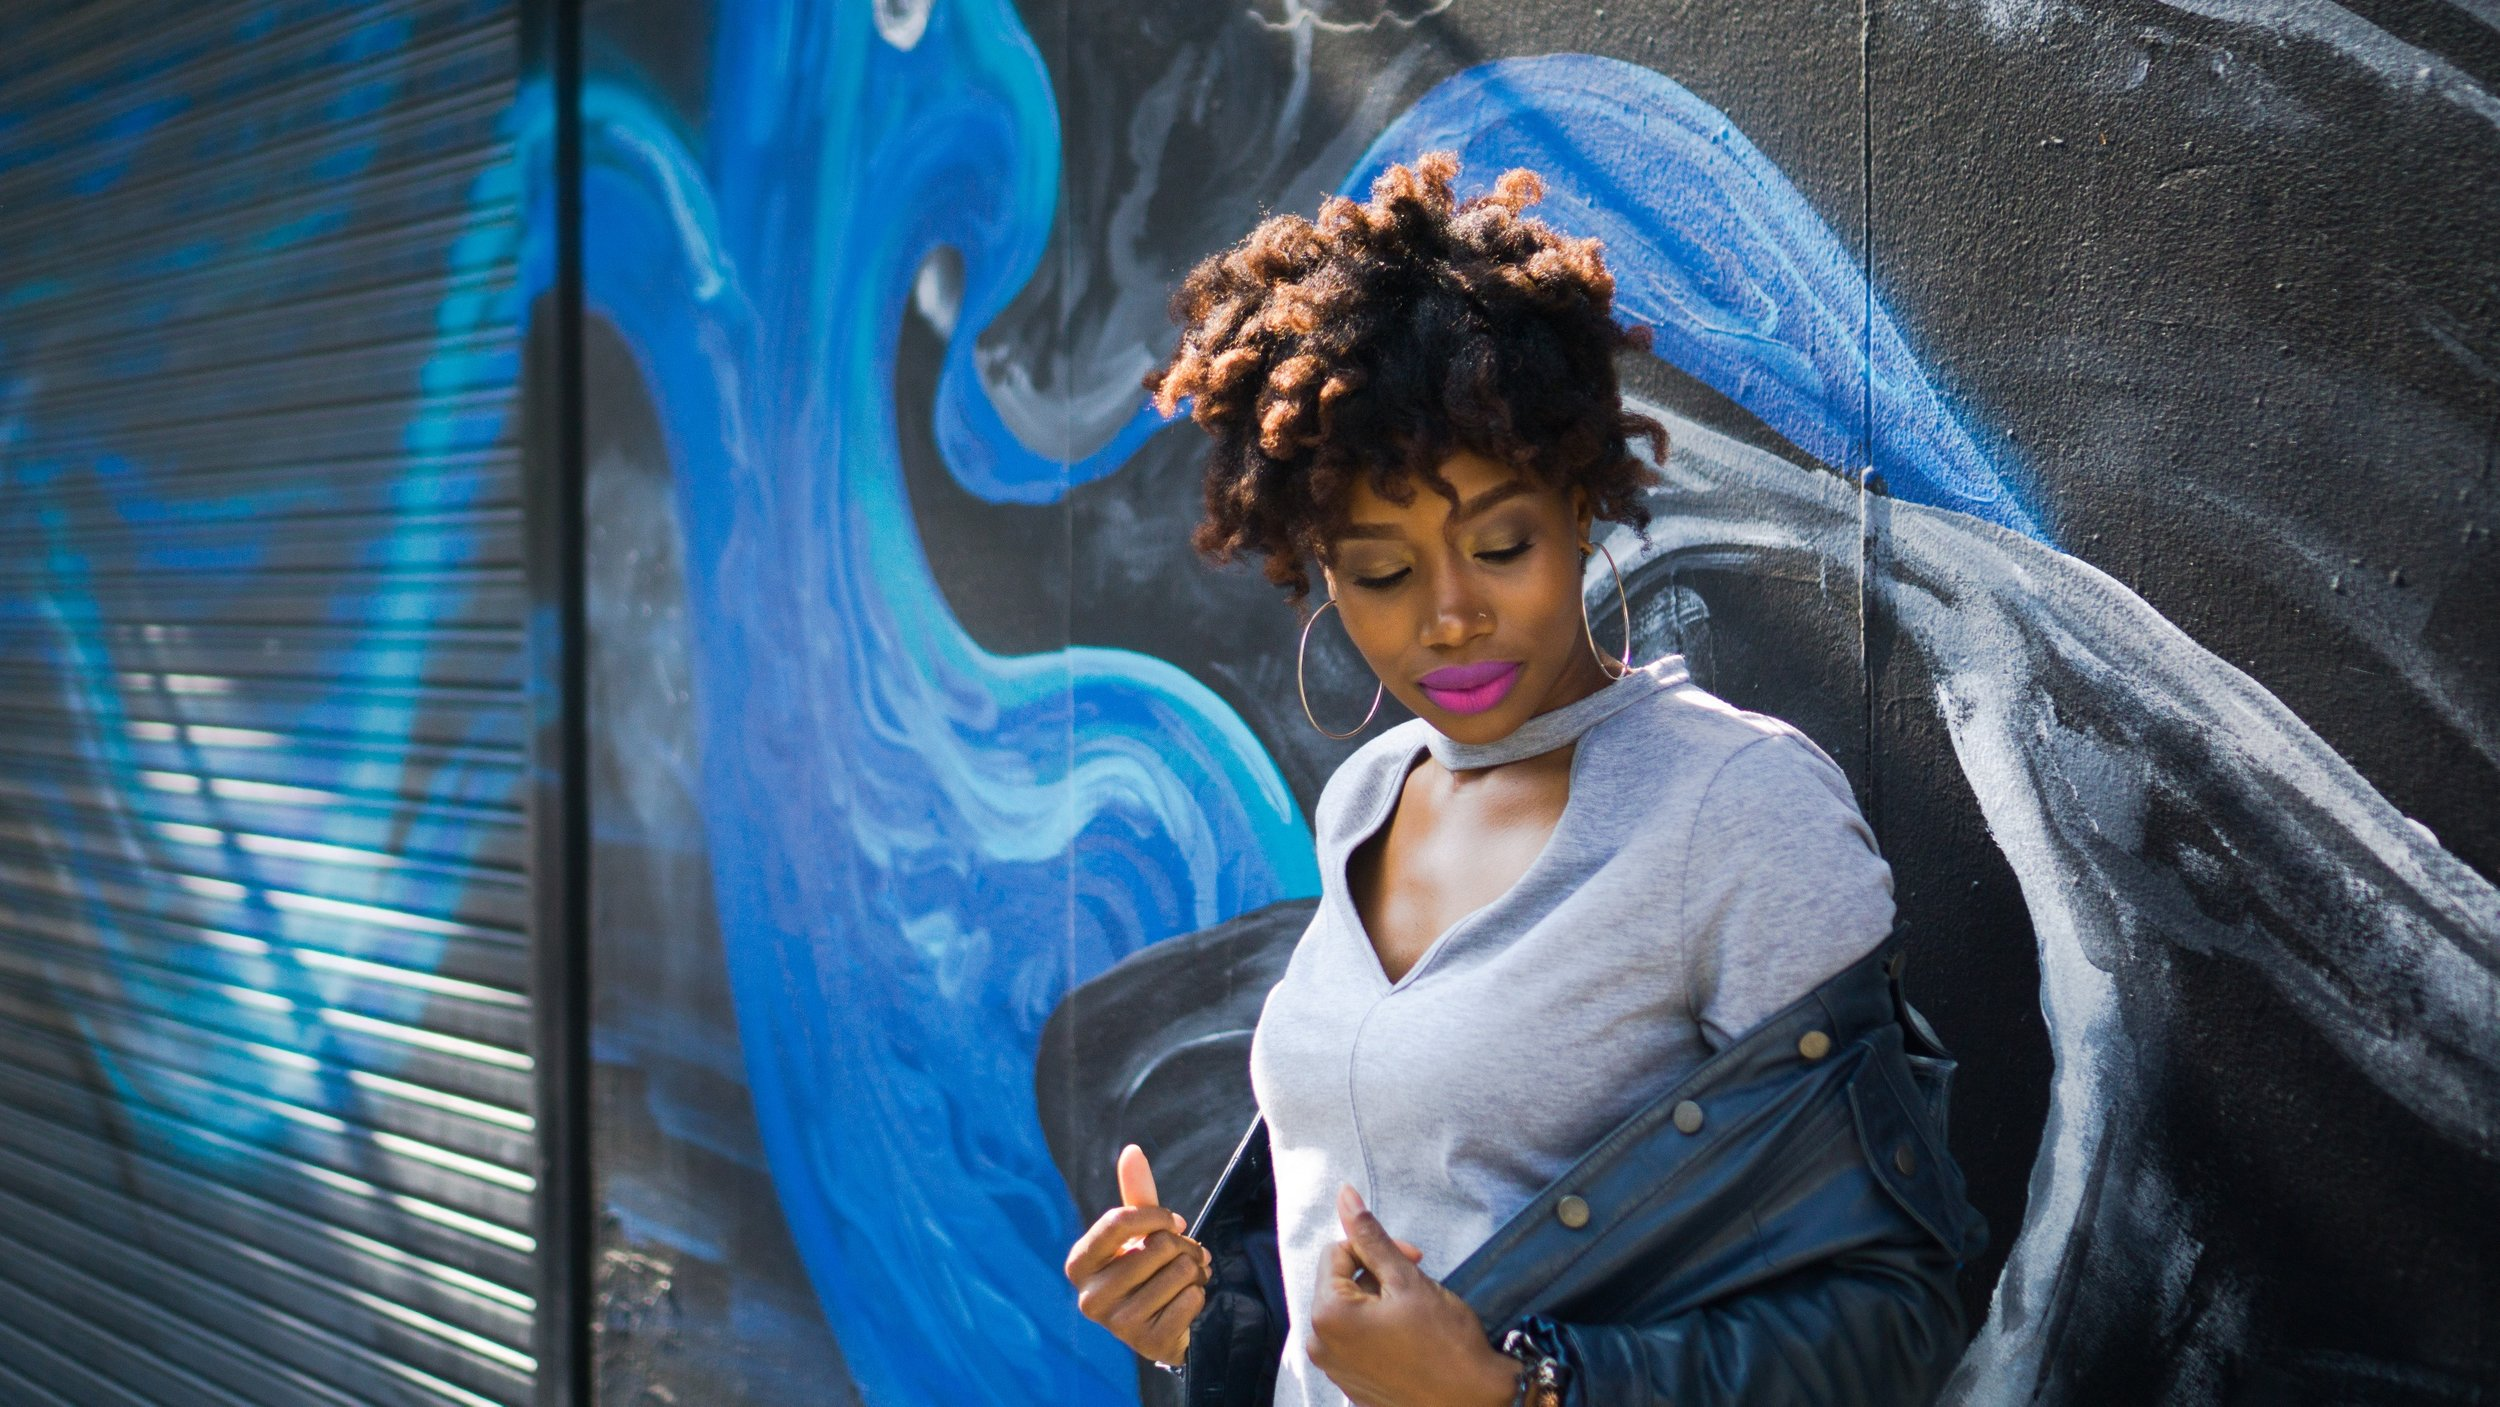 the-kashonna-files-fashion-style-ootd-blogger-natural-hair-blog.jpg